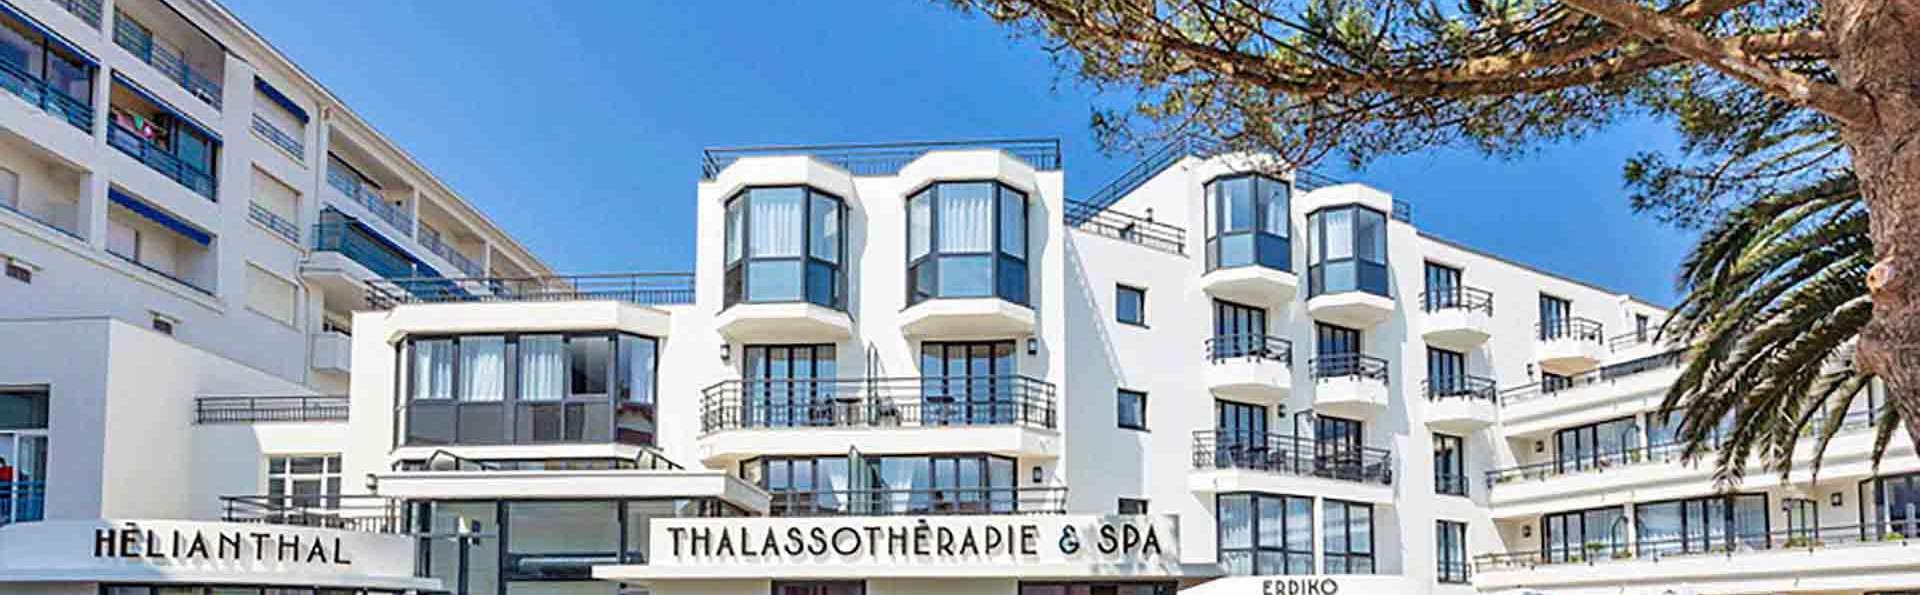 Hôtel Hélianthal Saint Jean de Luz & Spa by Thalazur - Edit_20200806103642-757e8854-me.jpg